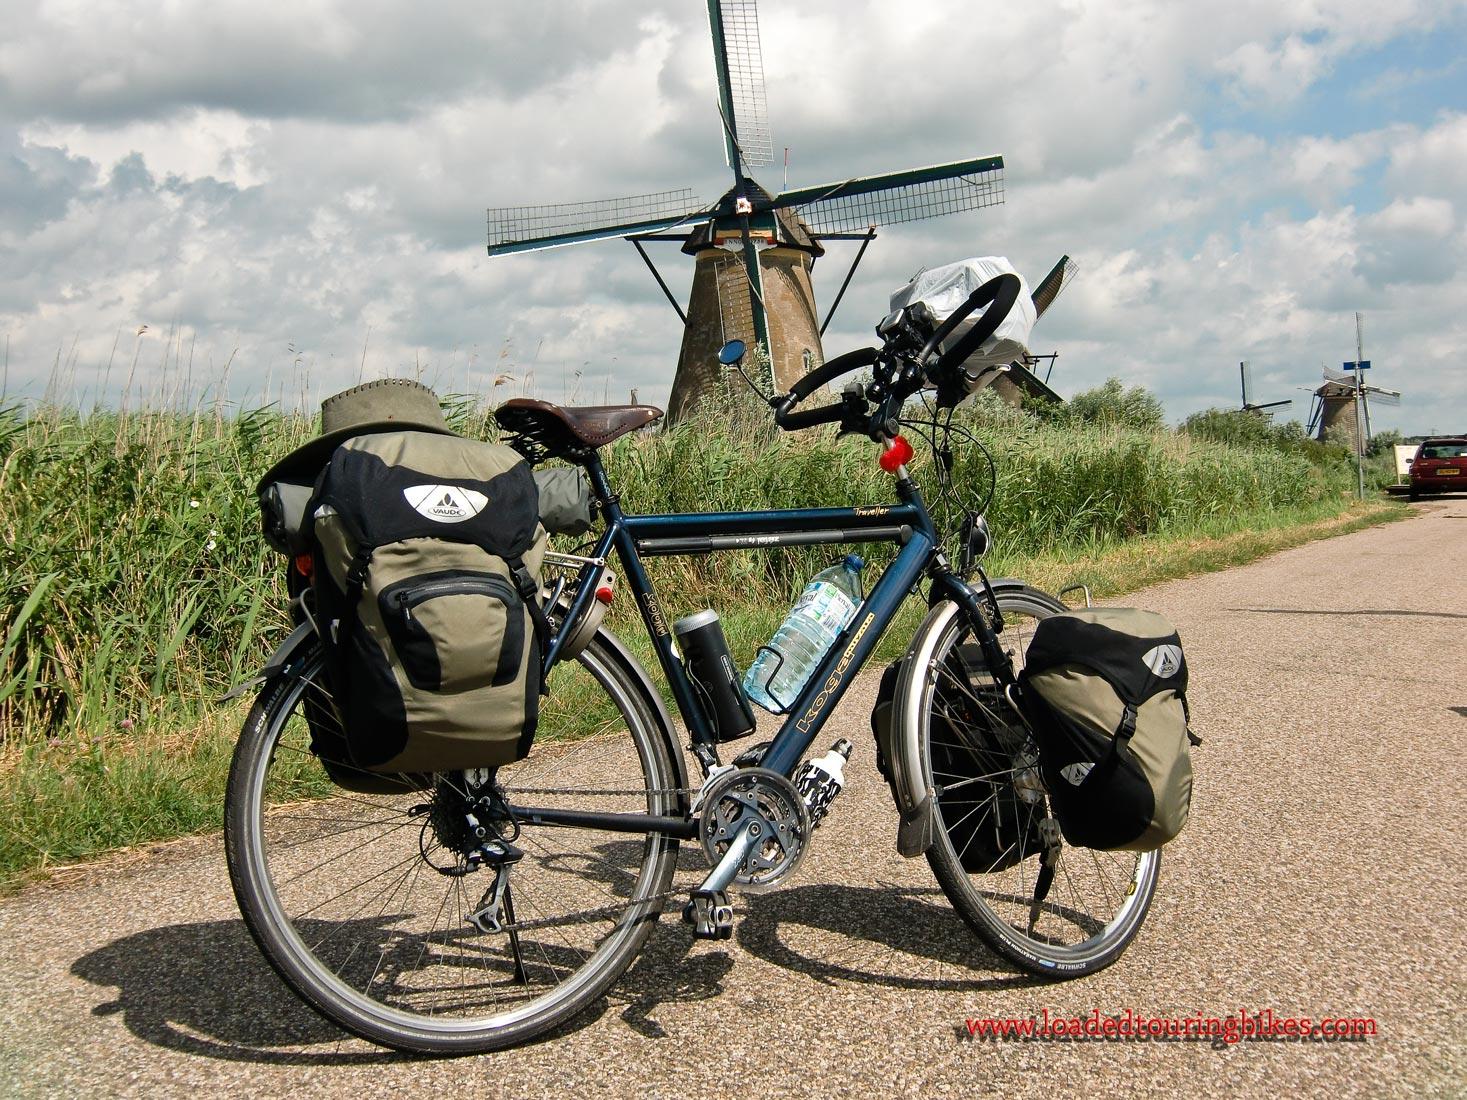 367    Dom Touring The Netherlands - Koga Miyata Traveller touring bike